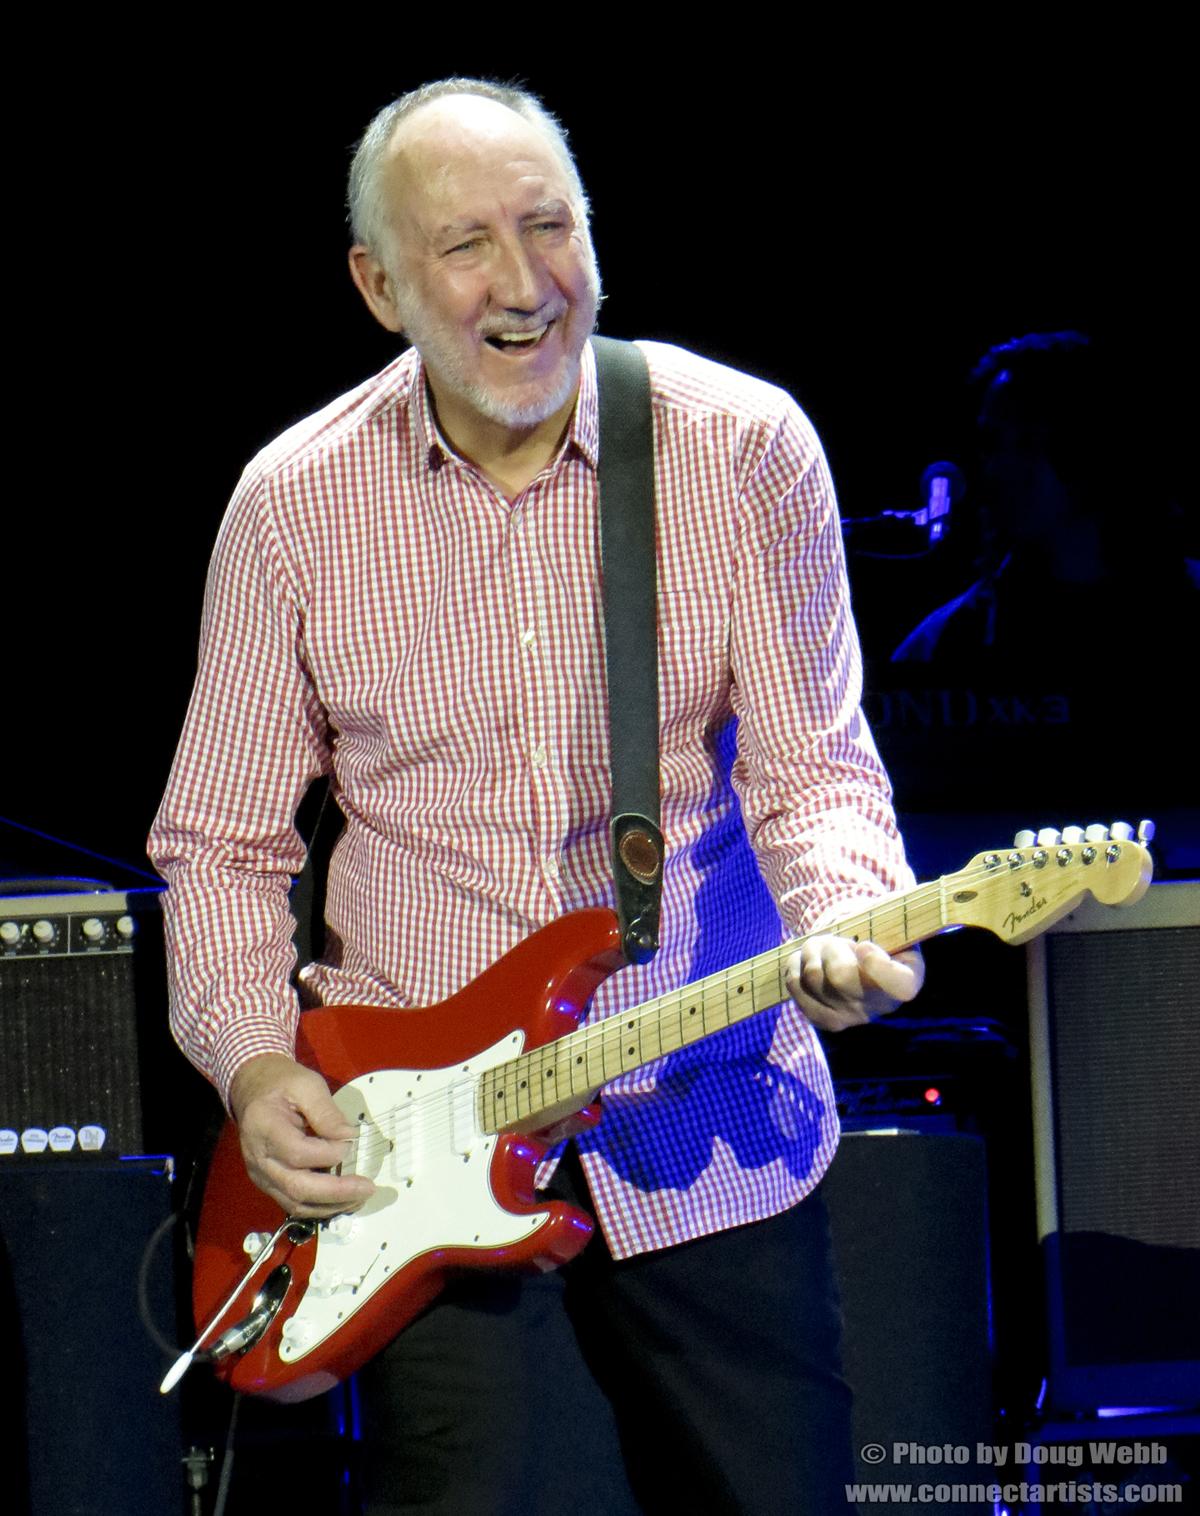 Pete Townshend / The Who / Target Center / Minneapolis, Minnesota / November 27th, 2012 / Photo by Doug Webb